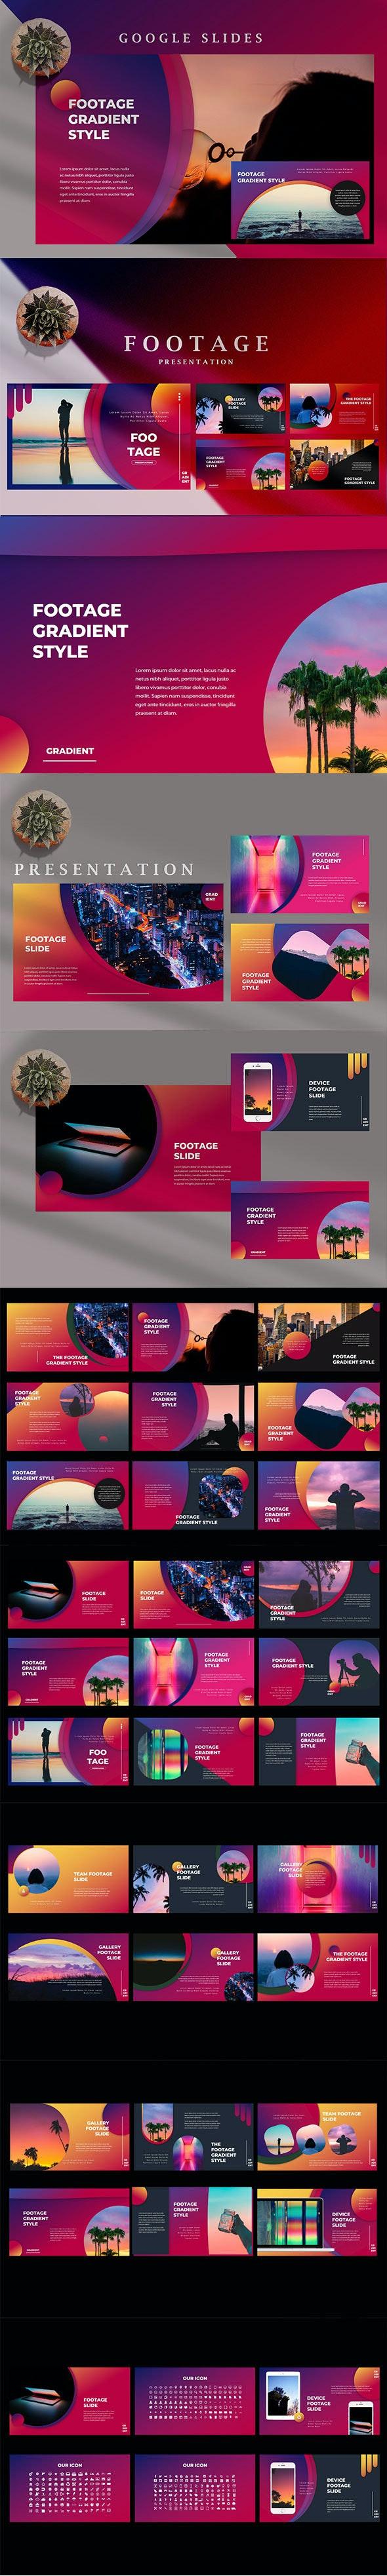 Footage Gradient - Beautiful Creative Google Slides - Google Slides Presentation Templates